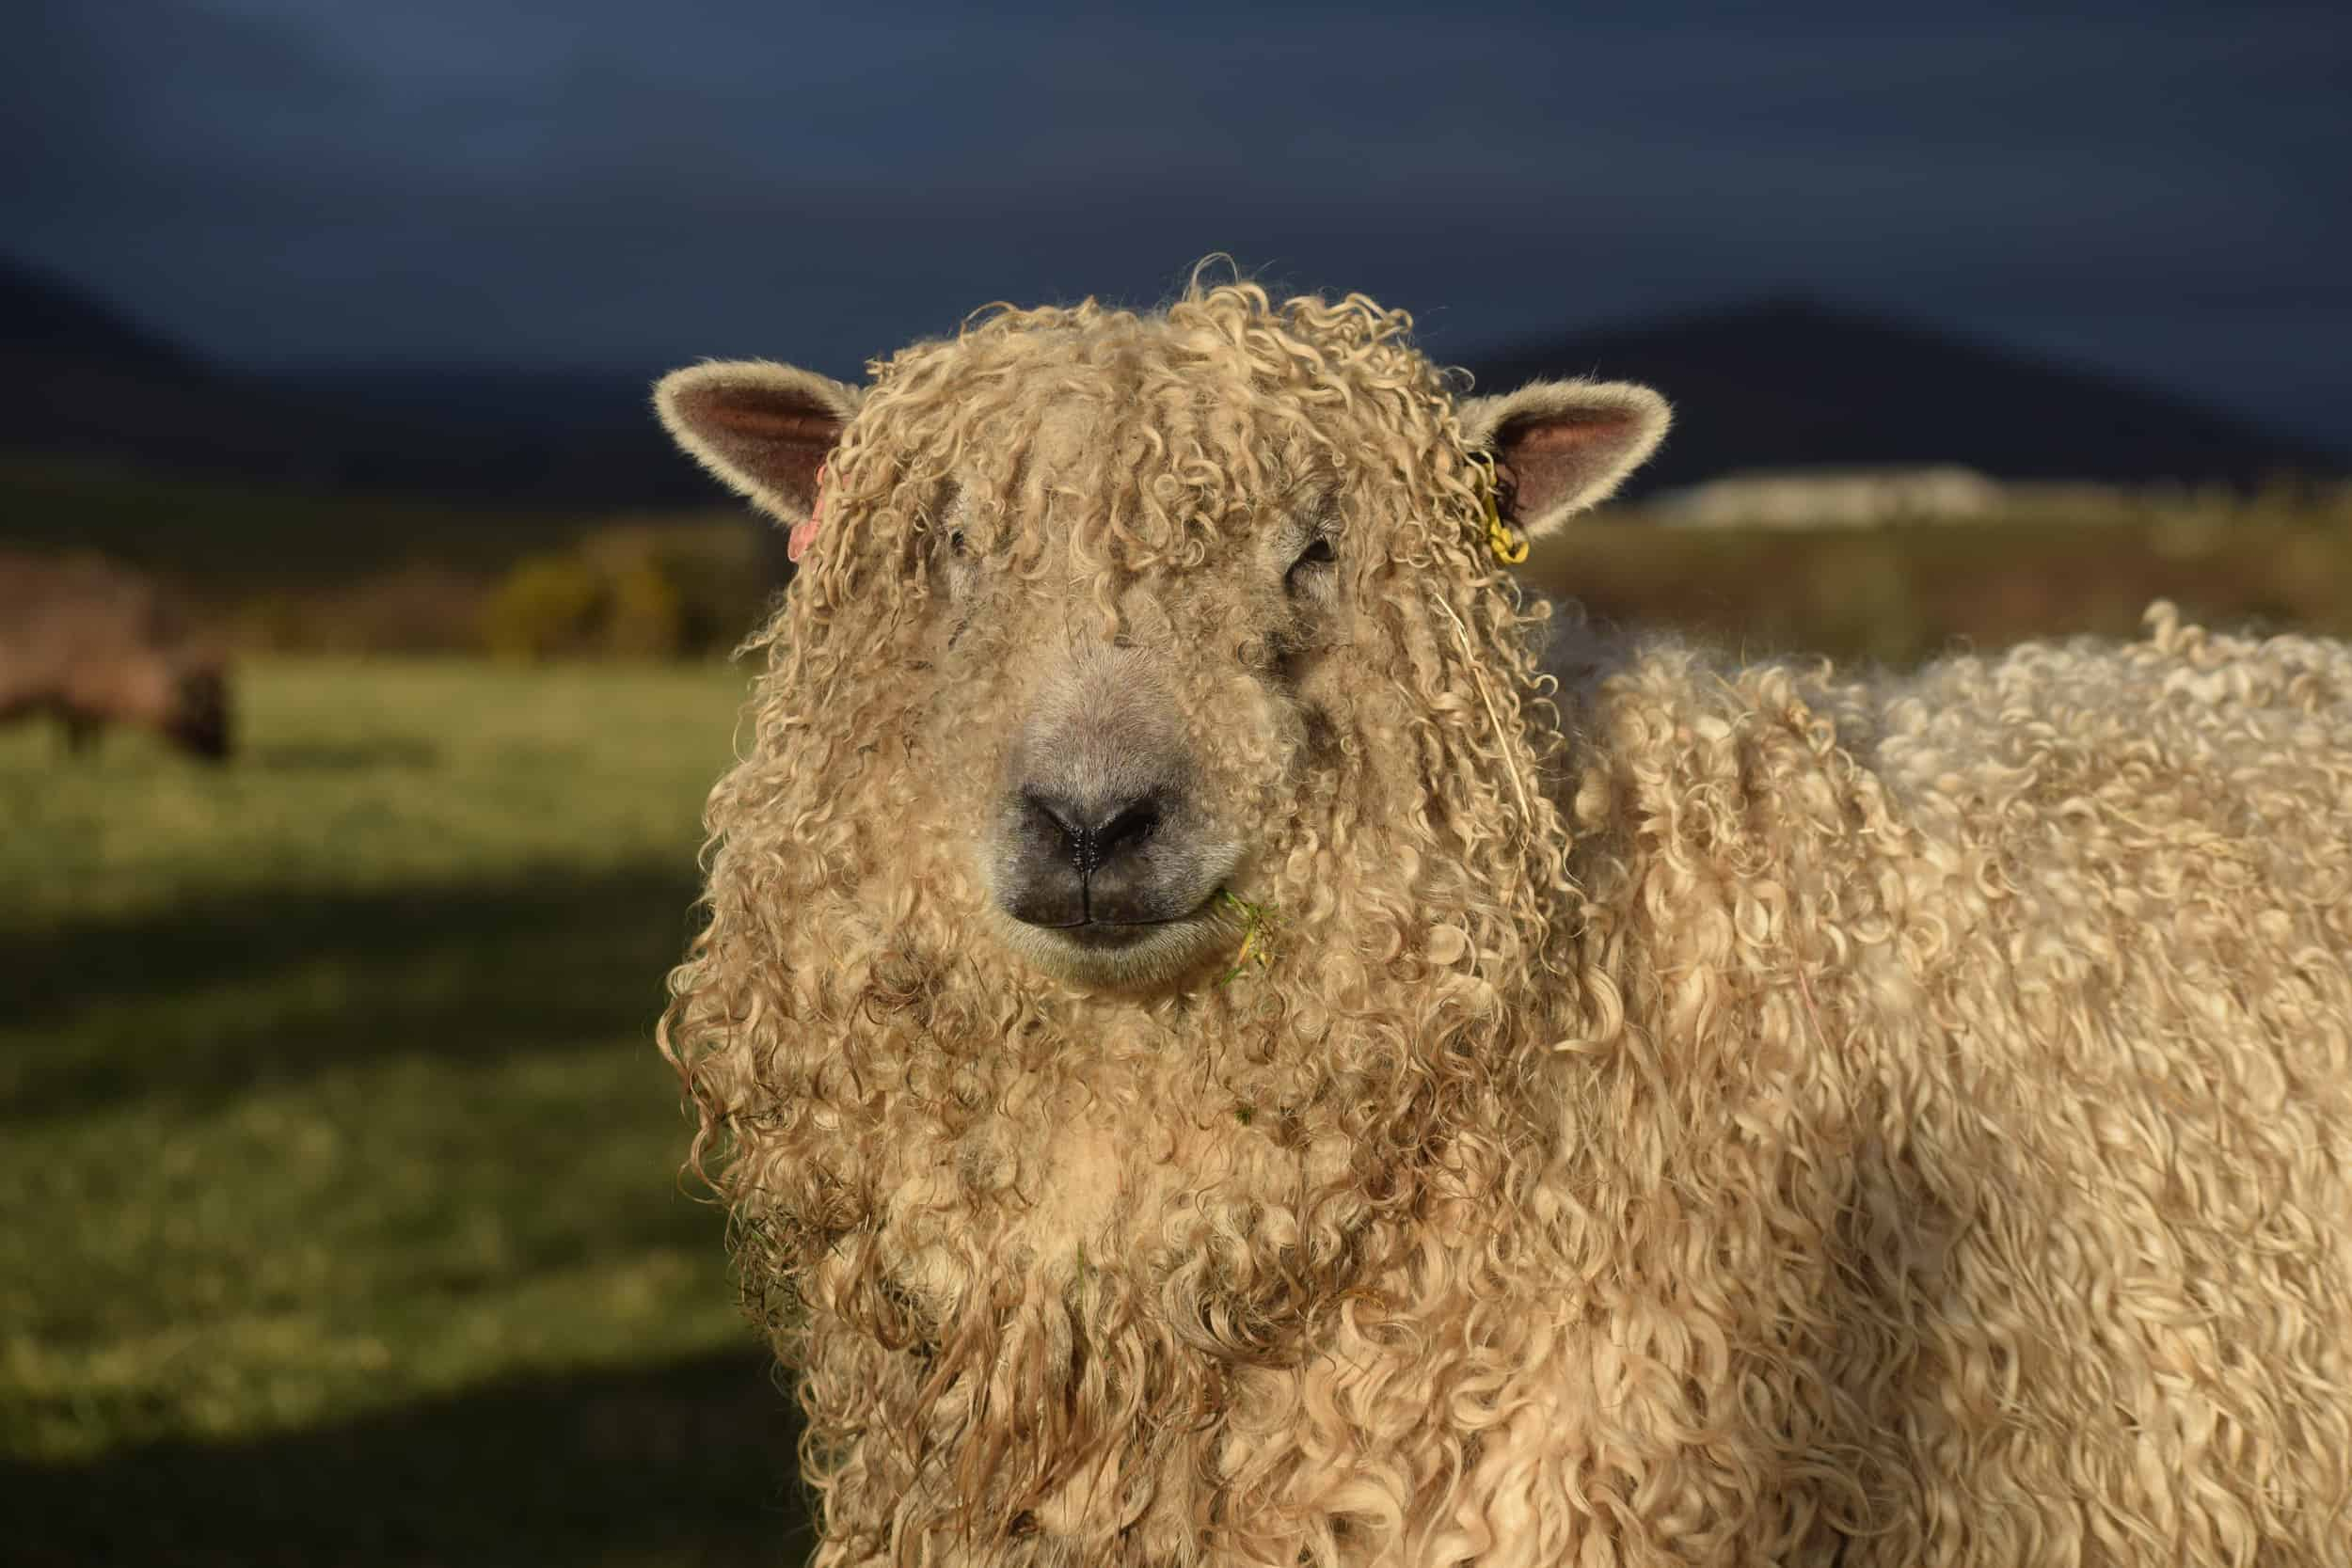 Alice patchwork sheep wensleydale cross greyface dartmoor gfd wool fiber